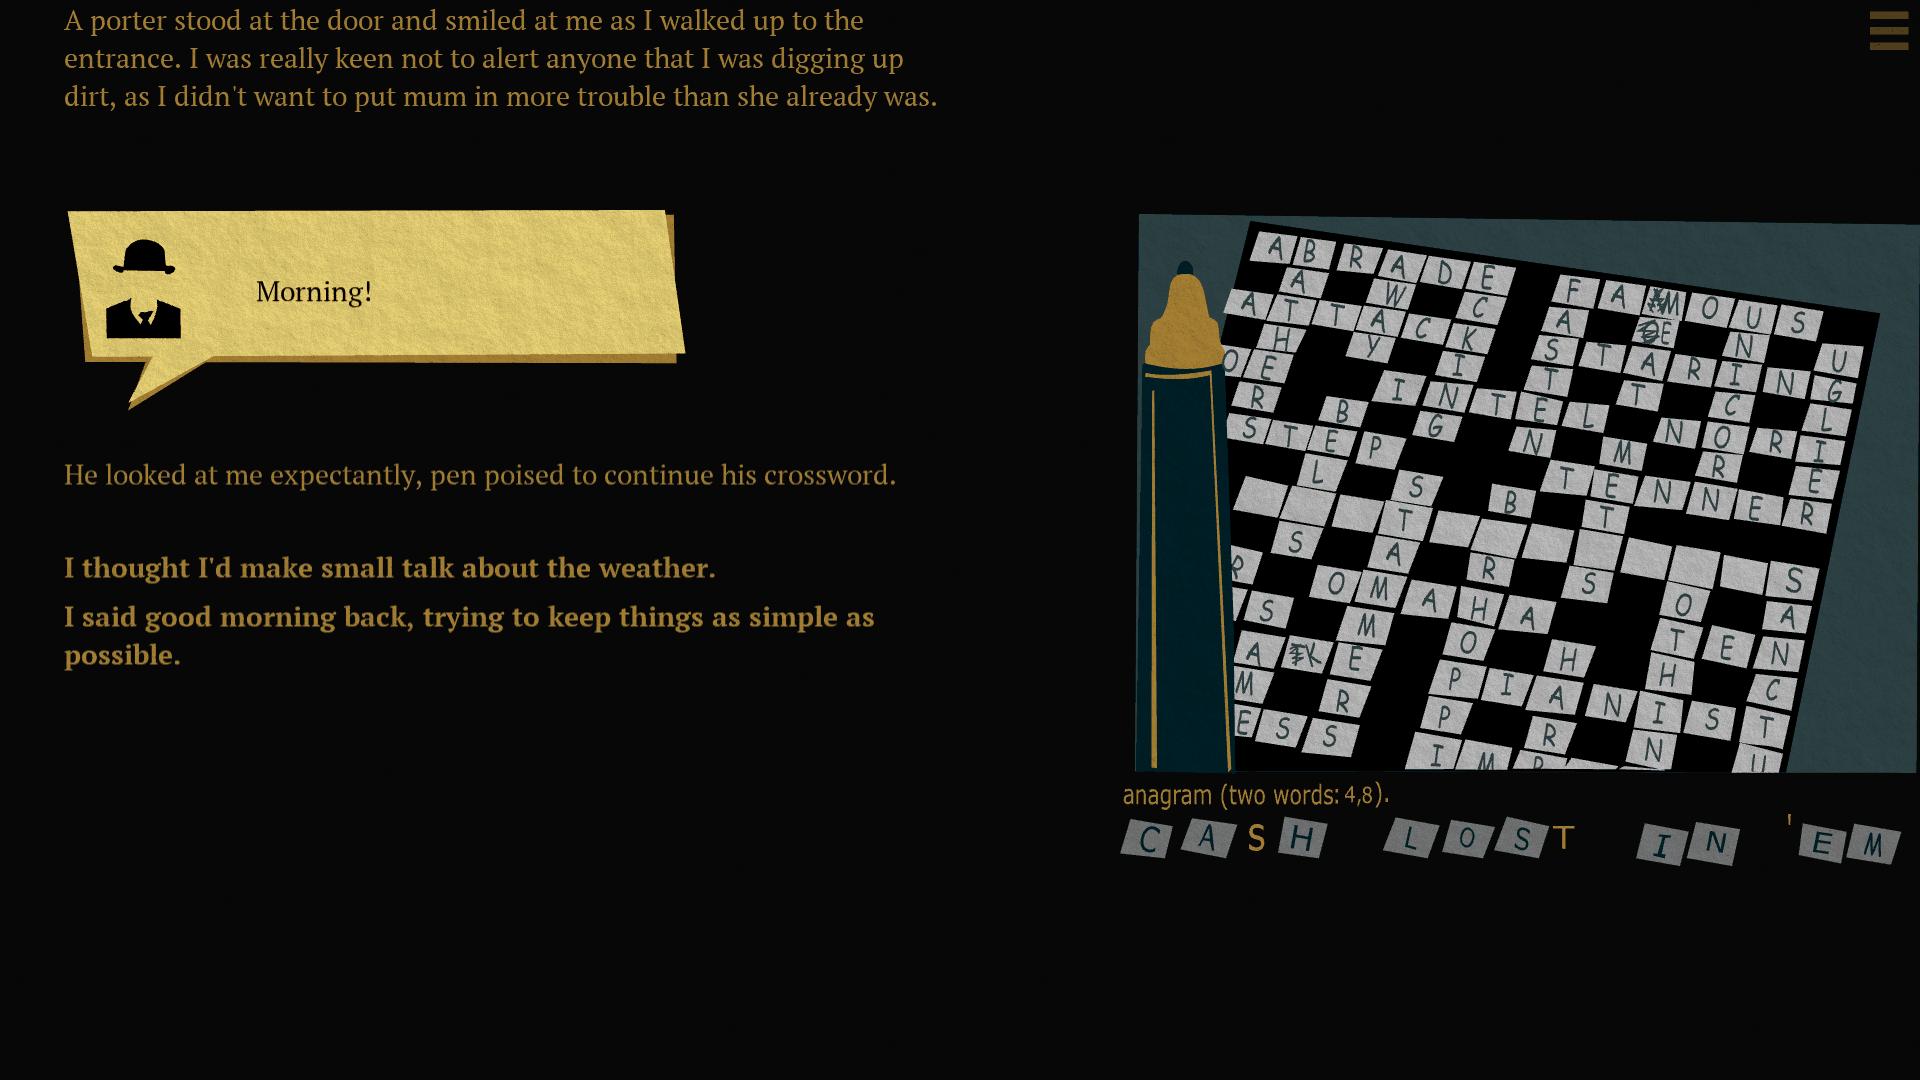 Sarawak - Crossword